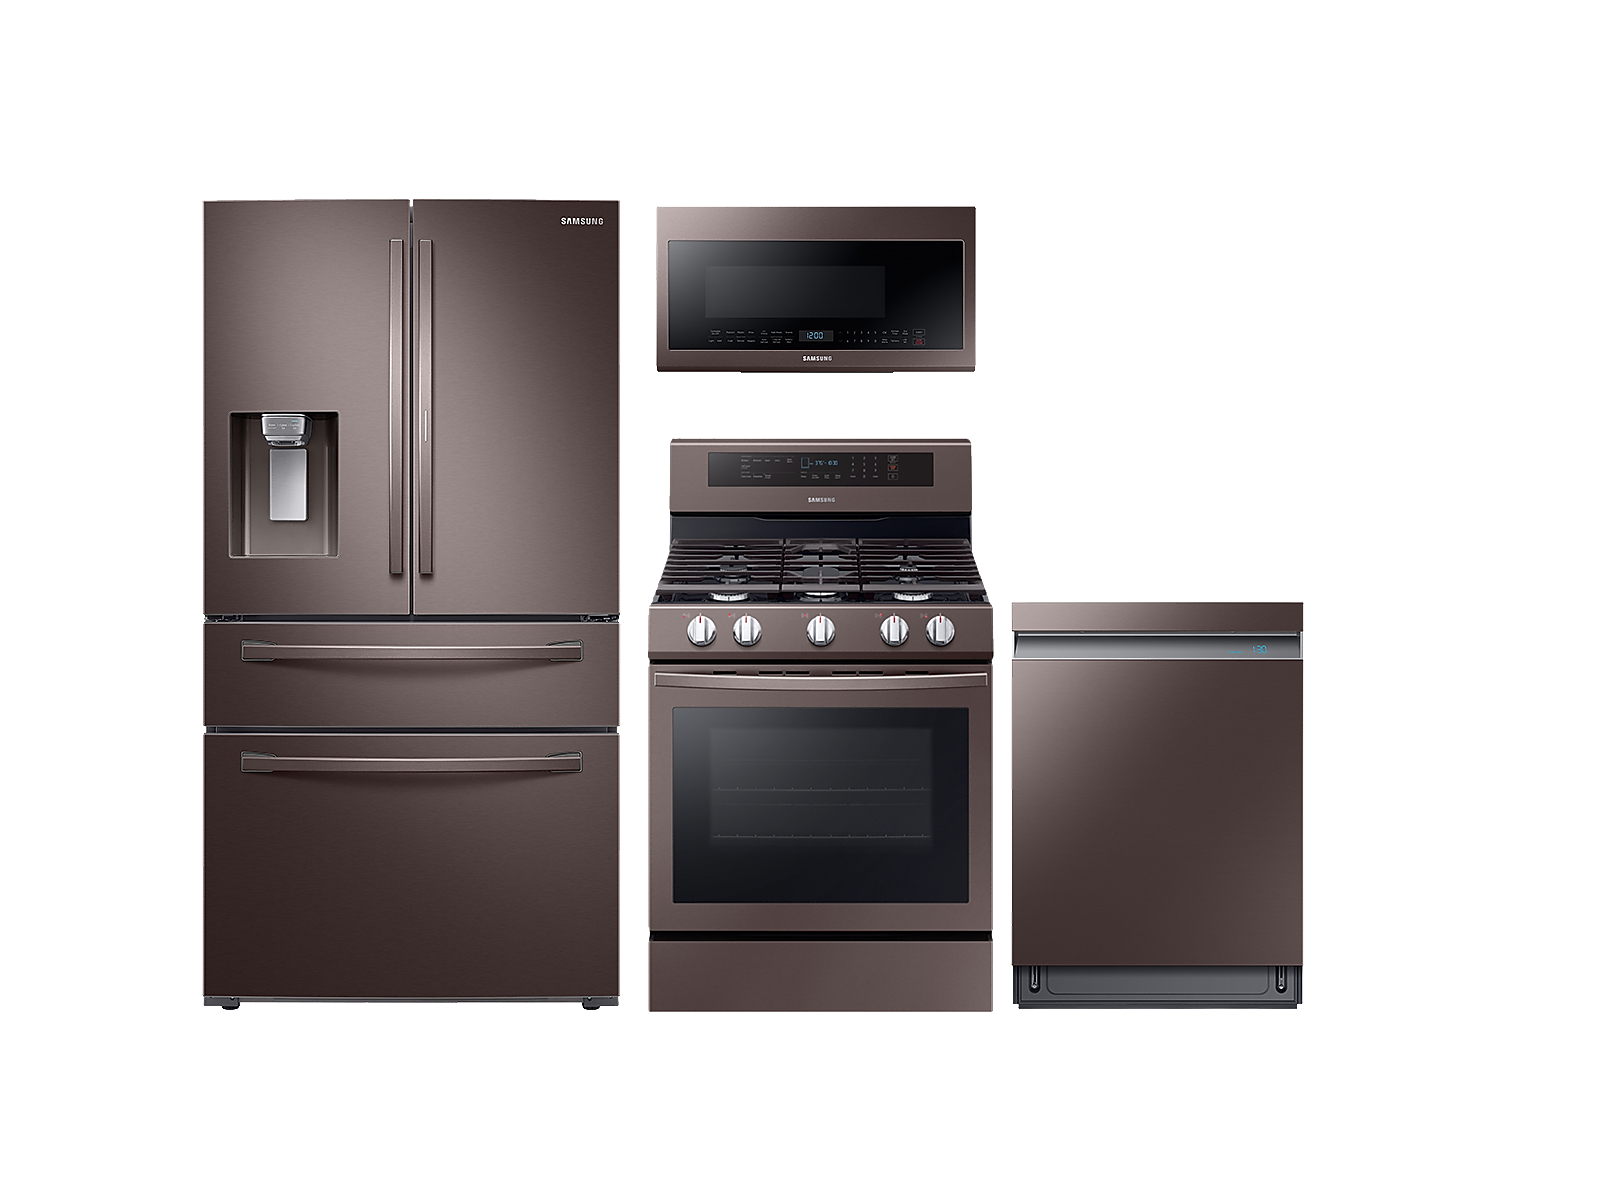 Samsung coupon: Samsung 4-door Refrigerator + Gas Range + Linear Wash Dishwasher + Microwave Kitchen Package in Tuscan Stainless(BNDL-1561027656961)